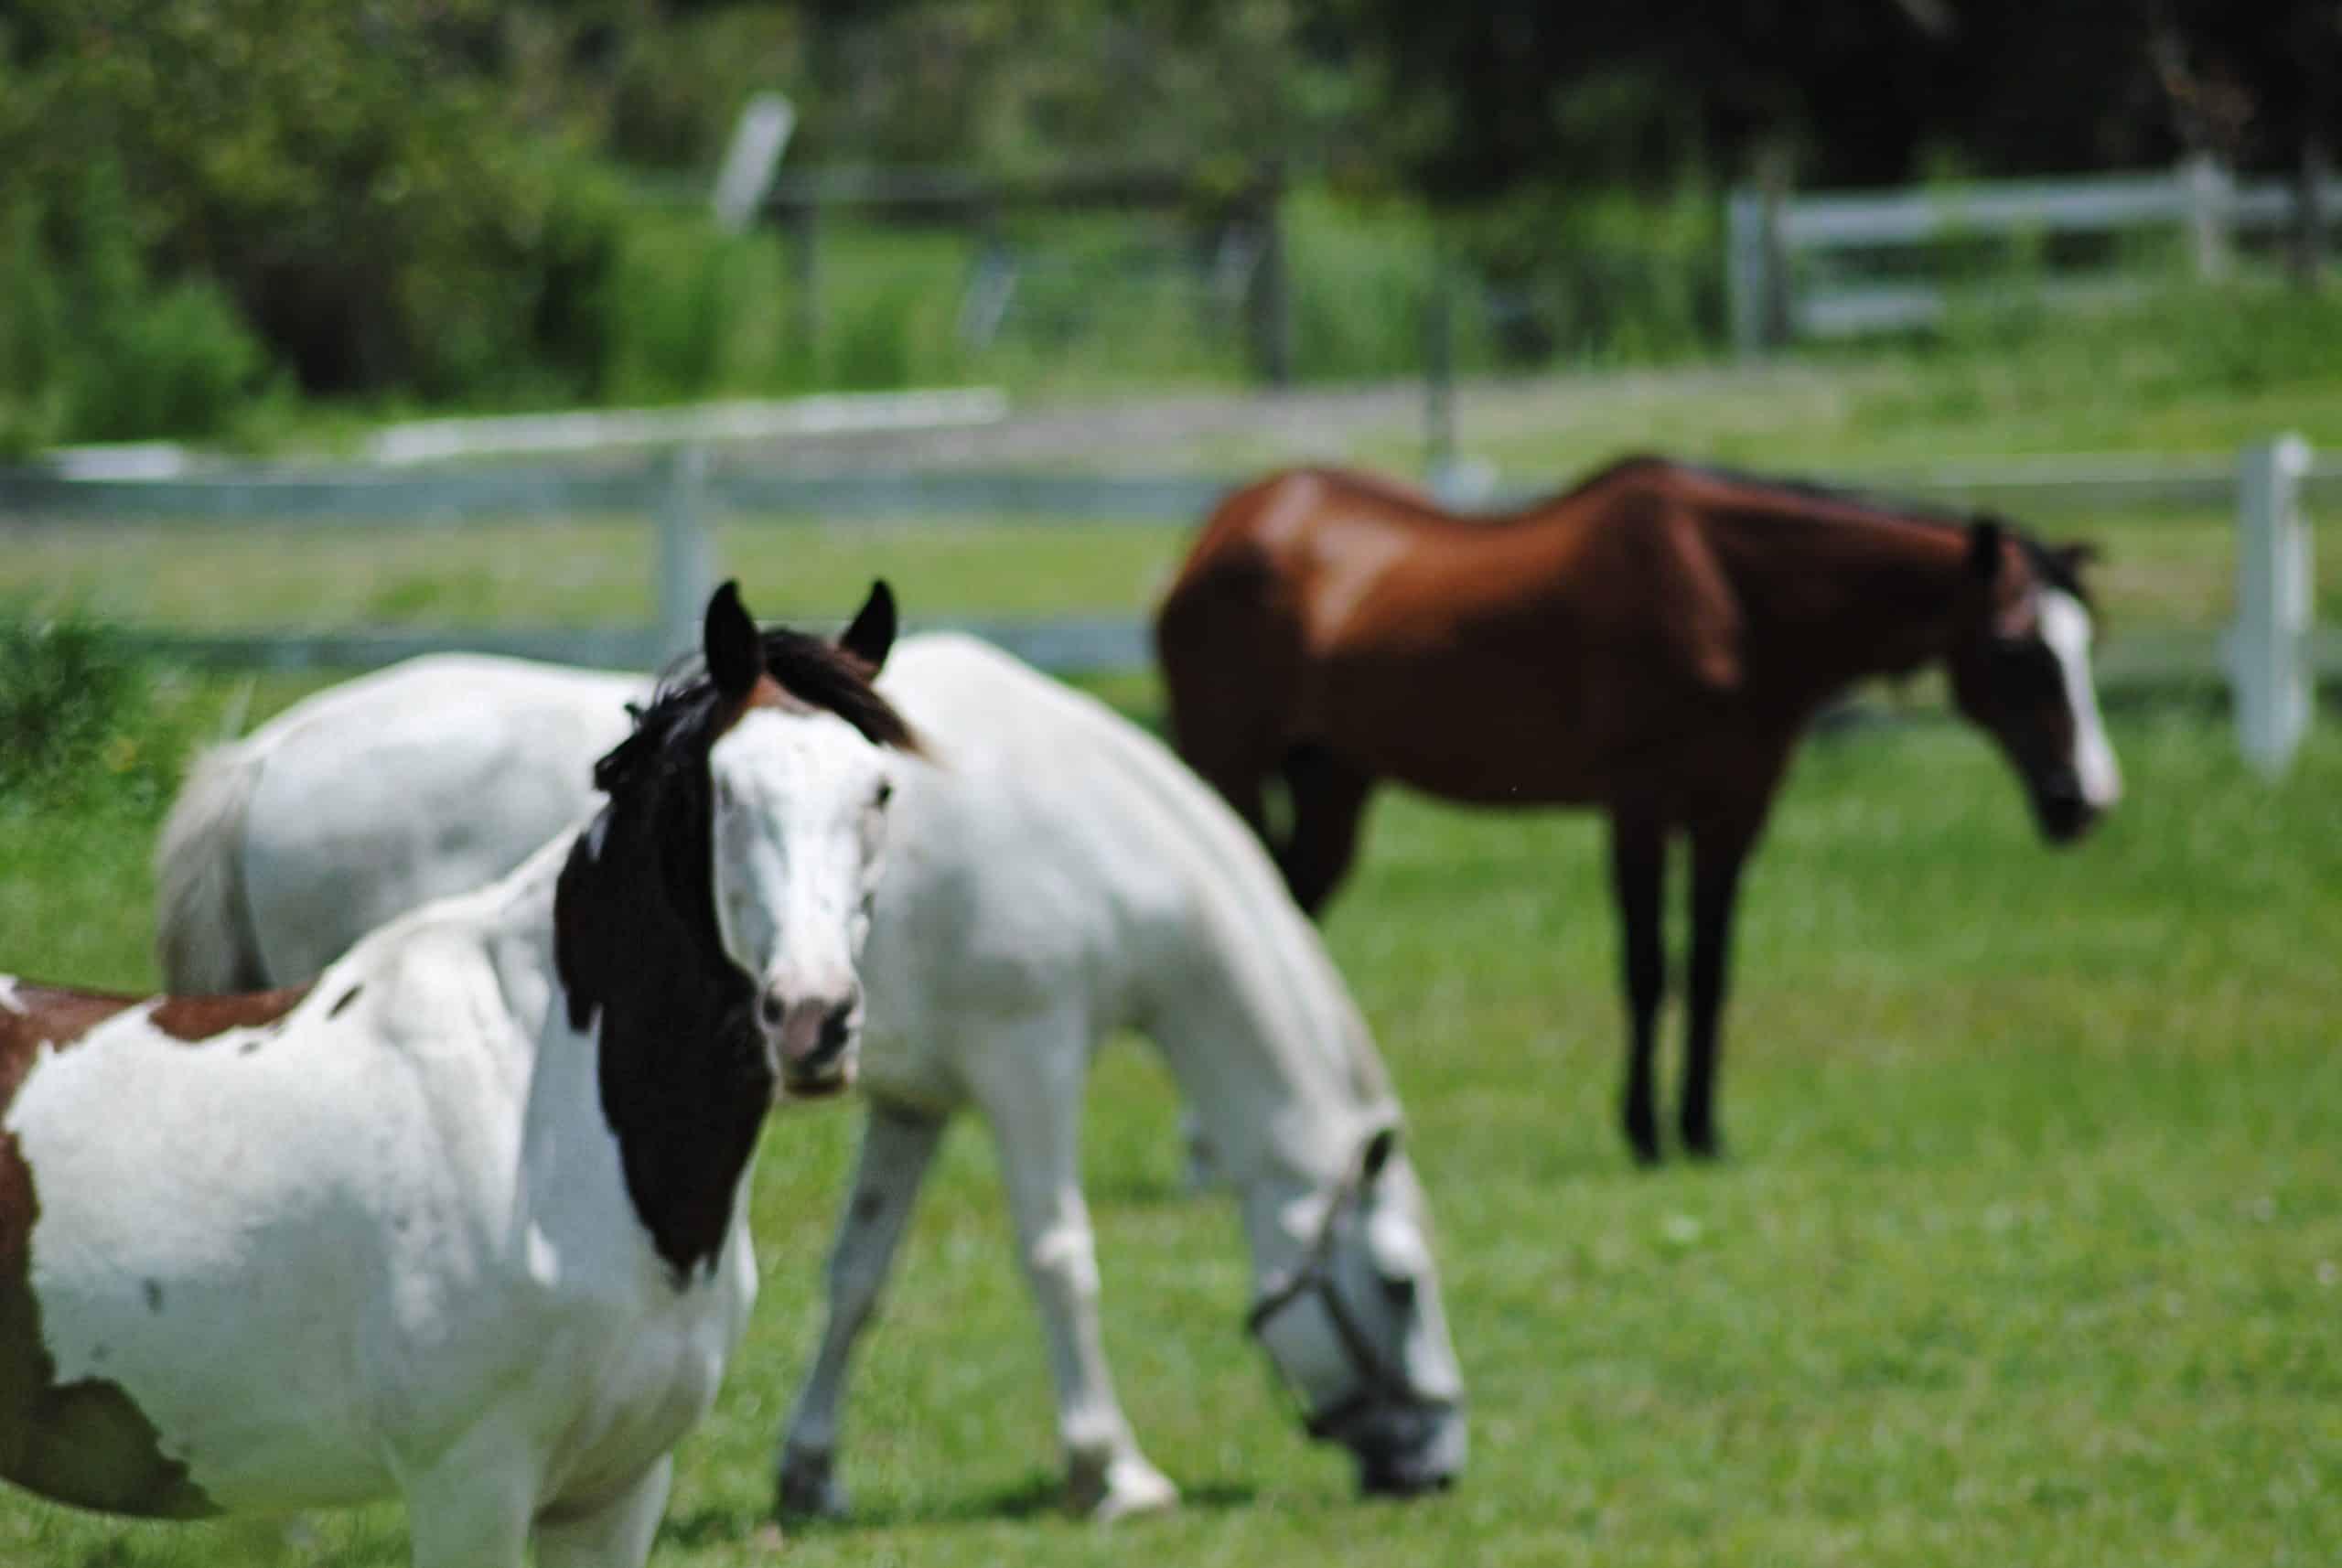 painted, multiple, horses, field, farm